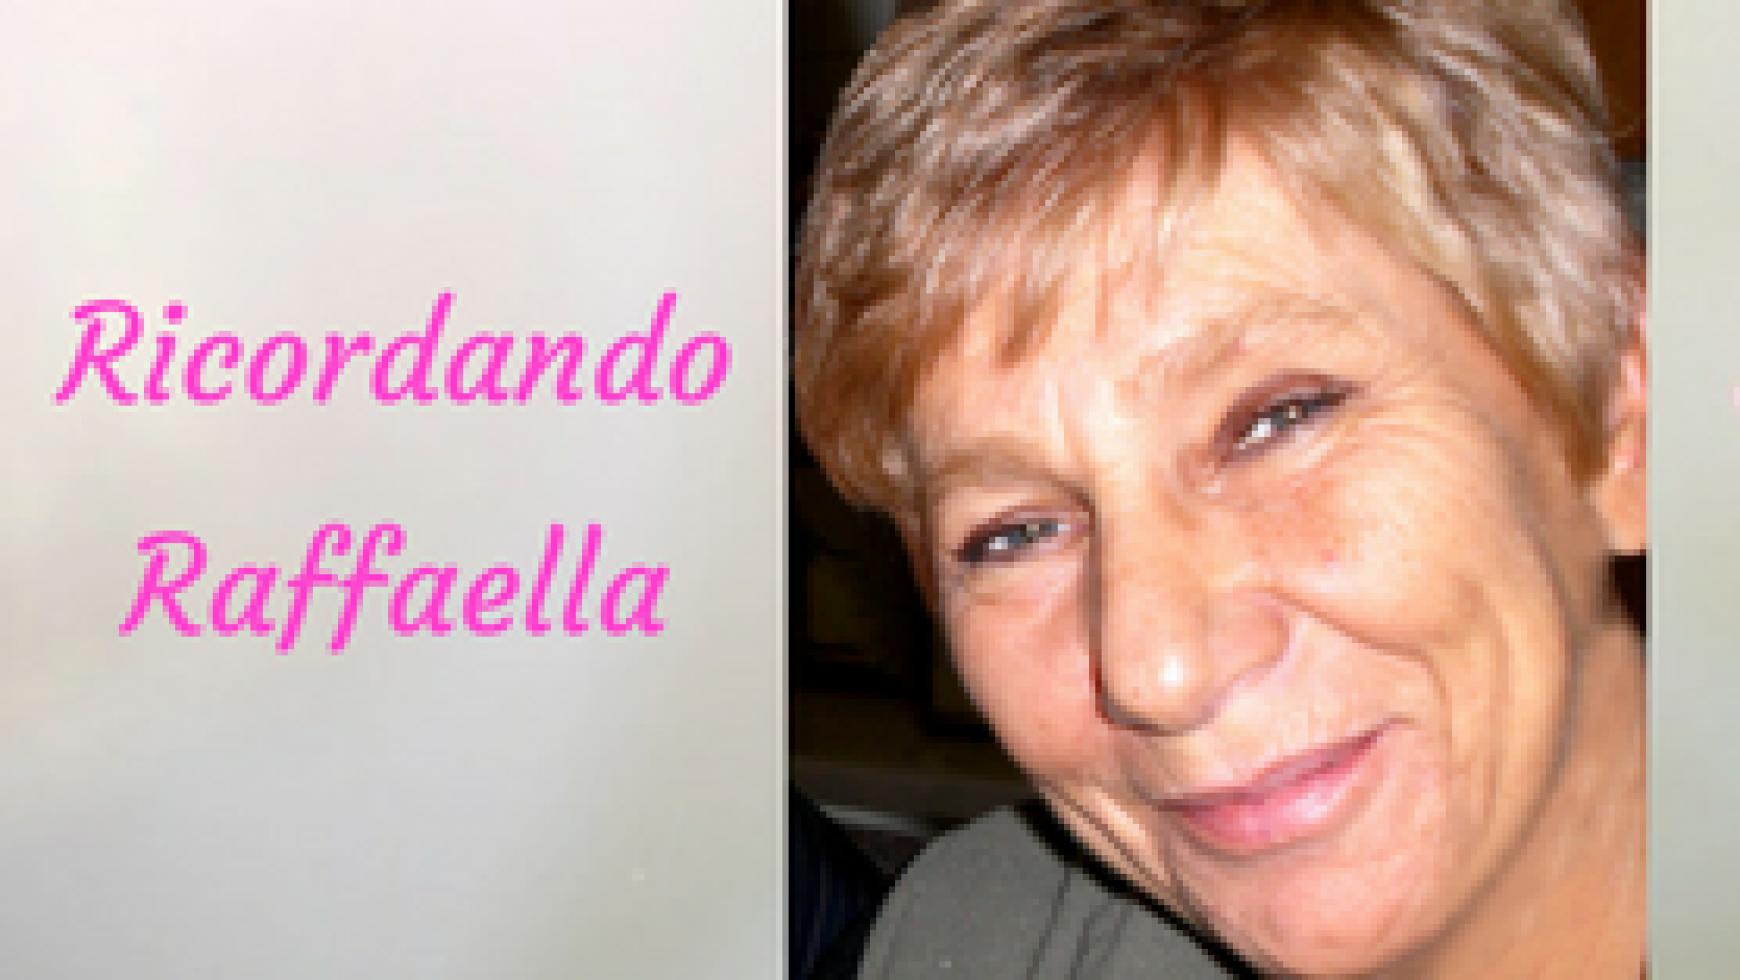 Ricordando Raffaella